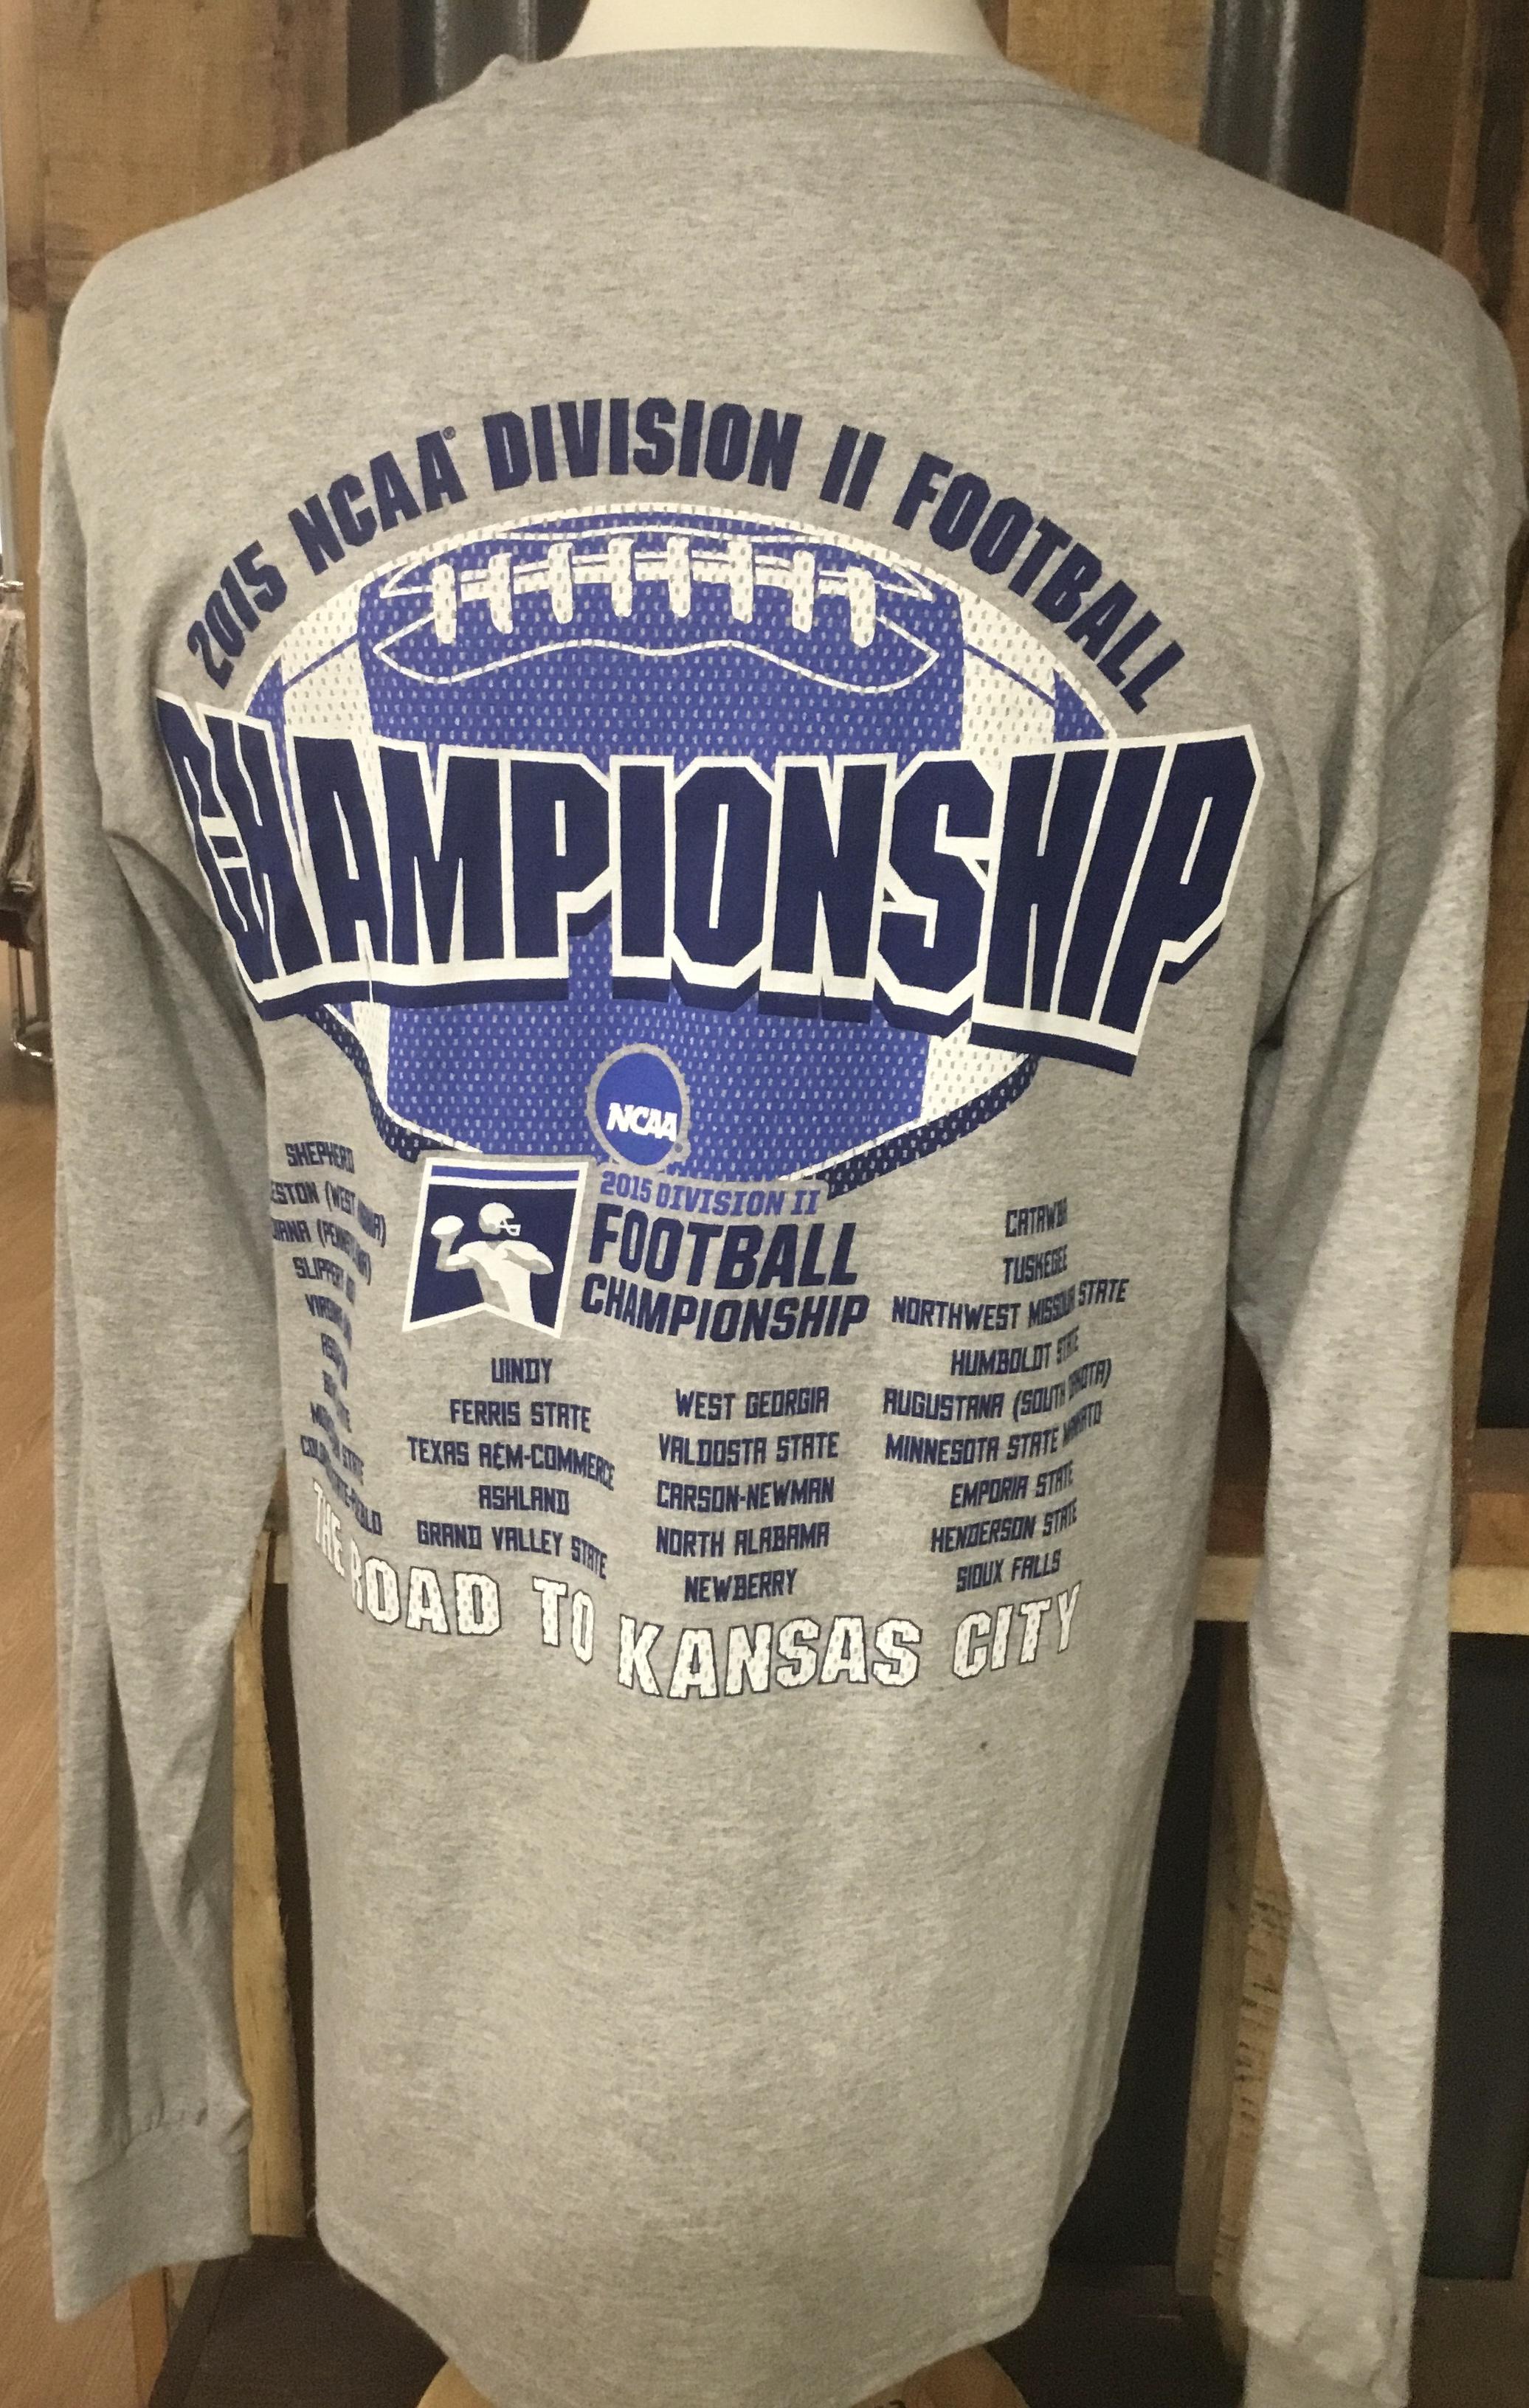 image of: 2015 NCAA DIVISION II FOOTBALL CHAMPIONSHIP LONG SLEEVE T-SHIRT